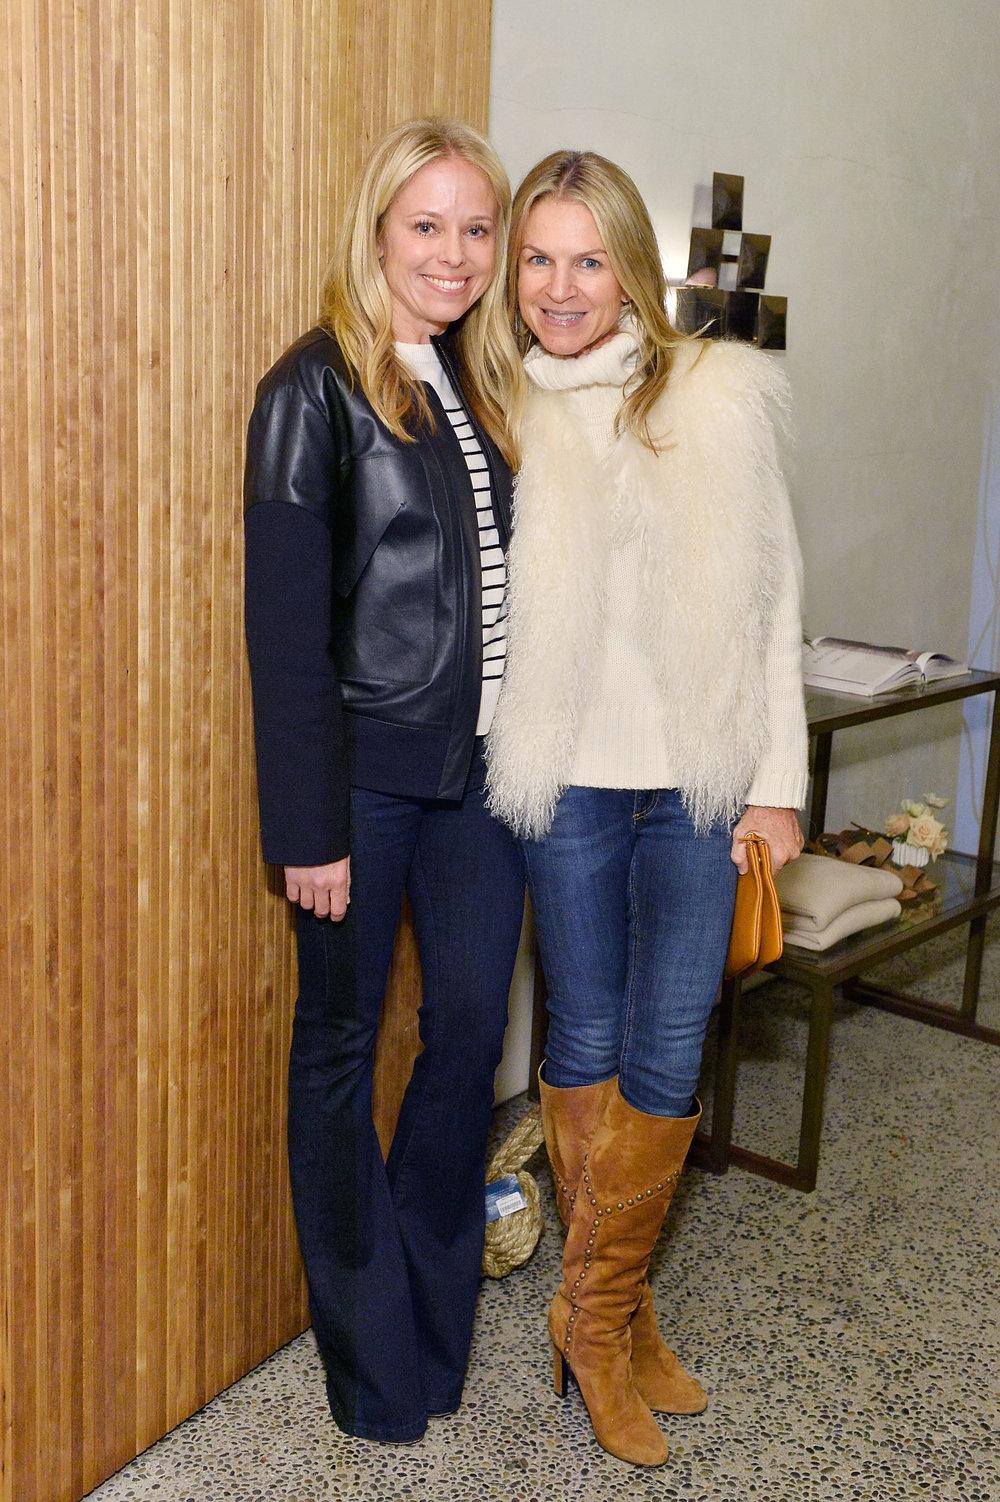 Shannon Rotenberg & Crystal Lourd